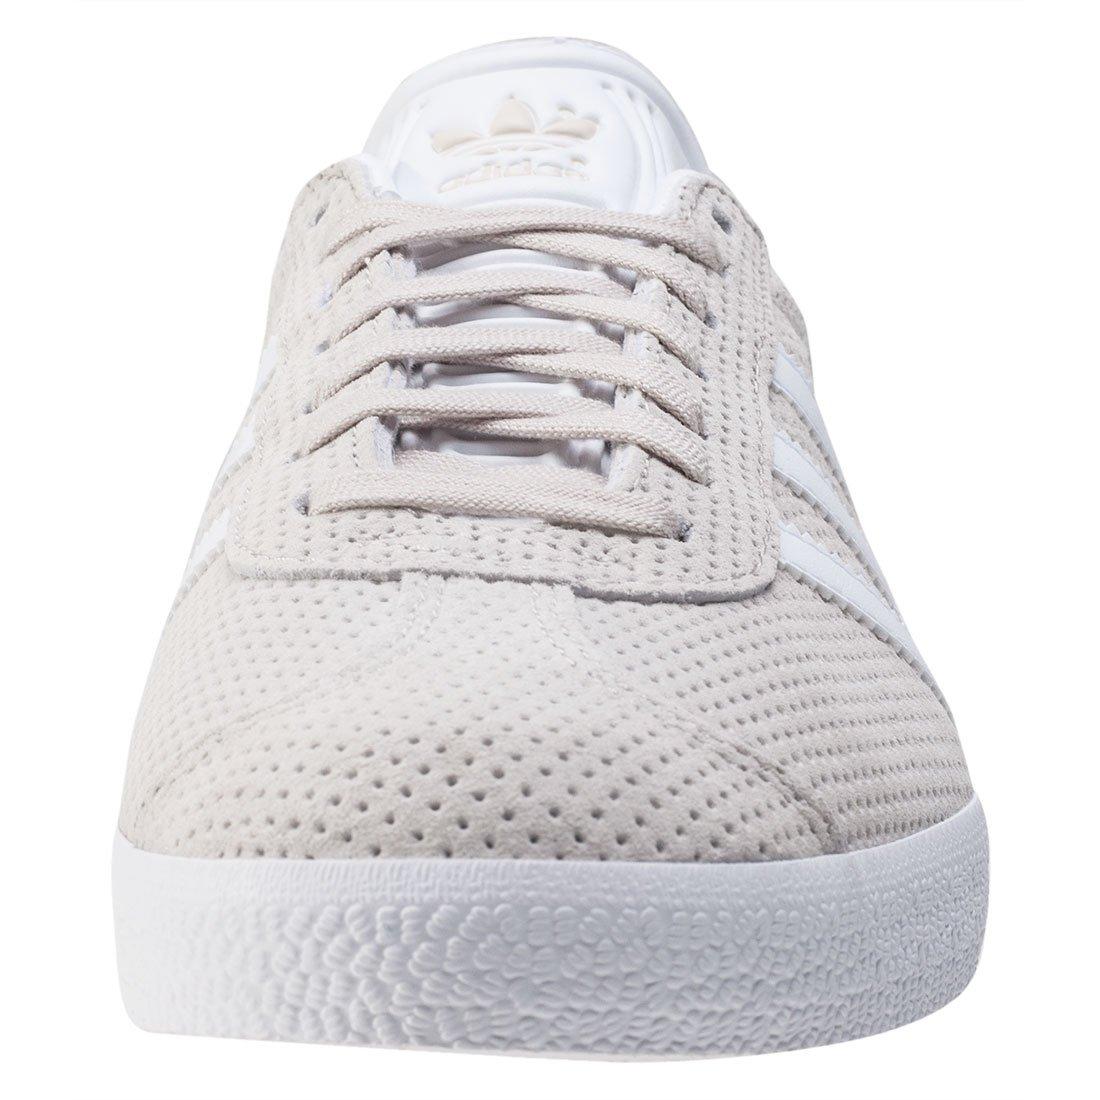 Adidas Damen Gazelle Sneakers Blau (Marcla (Marcla Blau / Ftwbla / Dormet 000) b8eea7